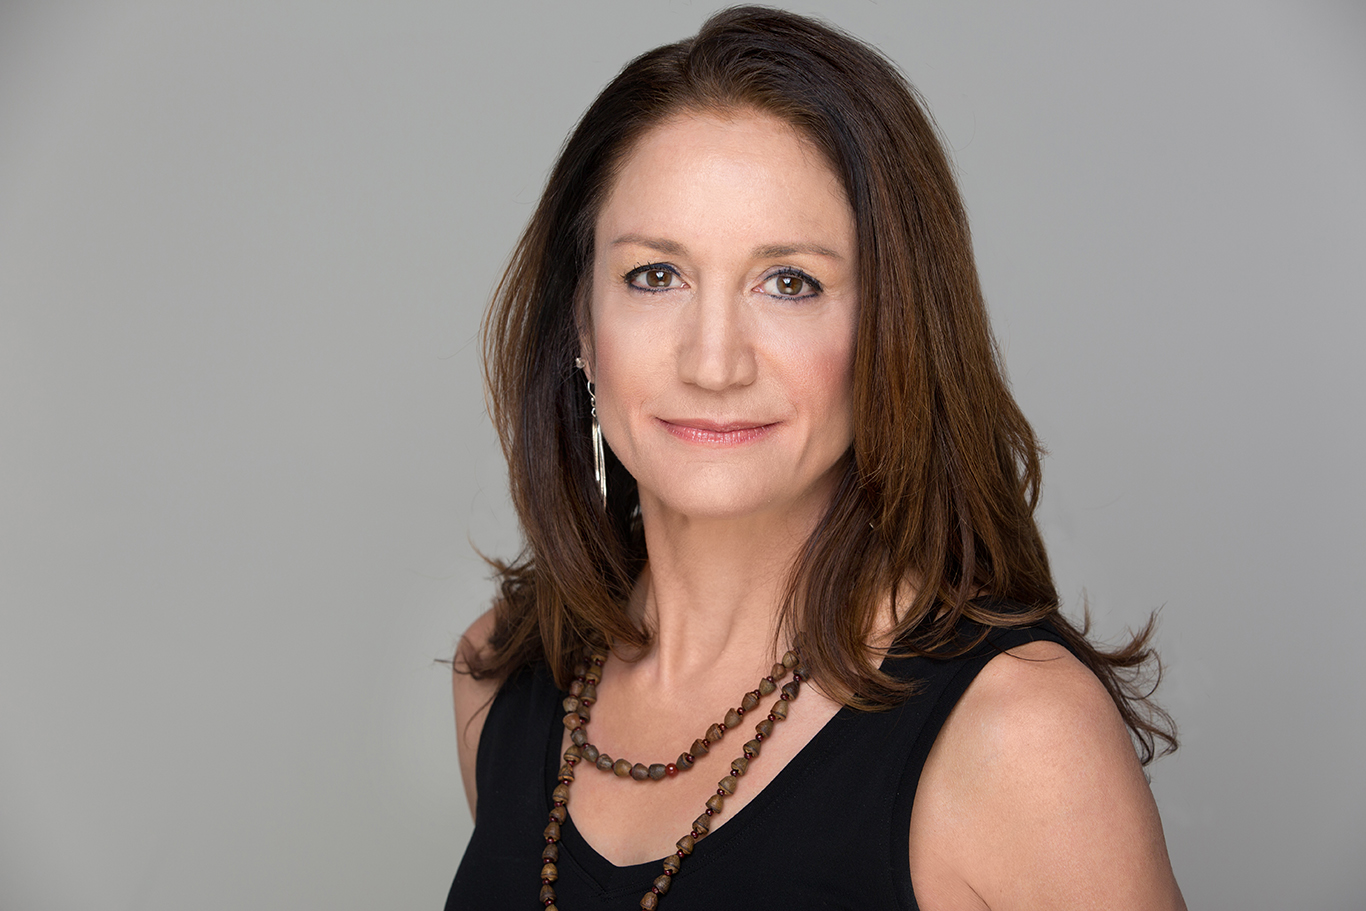 Lisa Jean Haskins